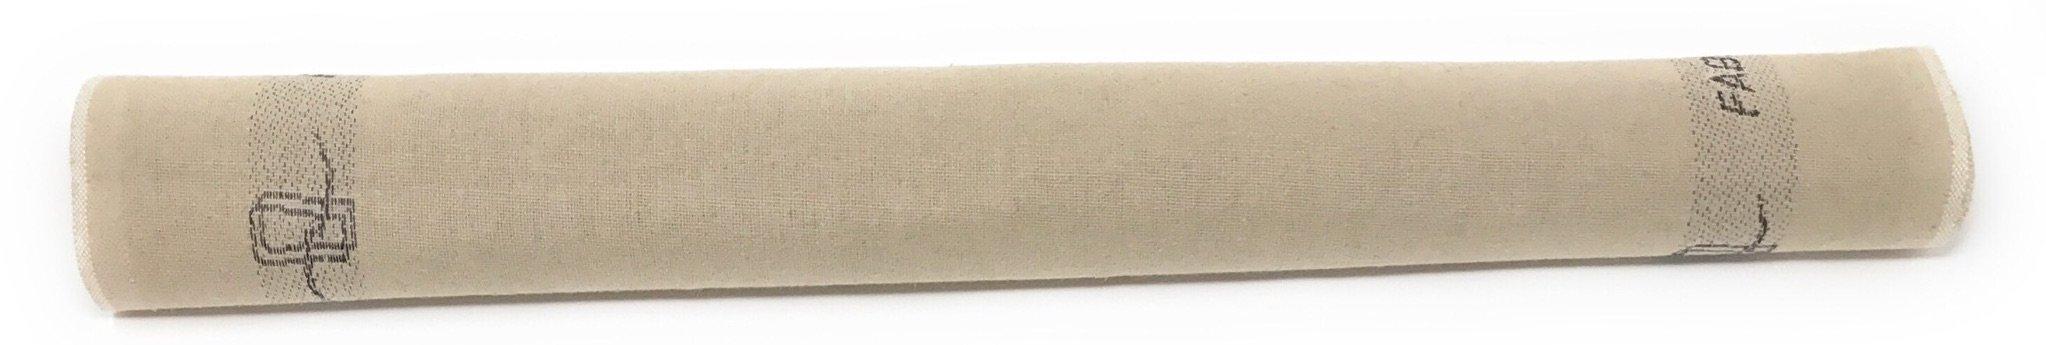 3-Piece Set: Emile Henry Ceramic Baguette Baker Charcoal, Mure & Peyrot Longuet Bread Scoring Lame, Matfer Baker's Couche Proofing Cloth Linen, 23.5 x 35.5 - Bundle by Mixed (Image #5)